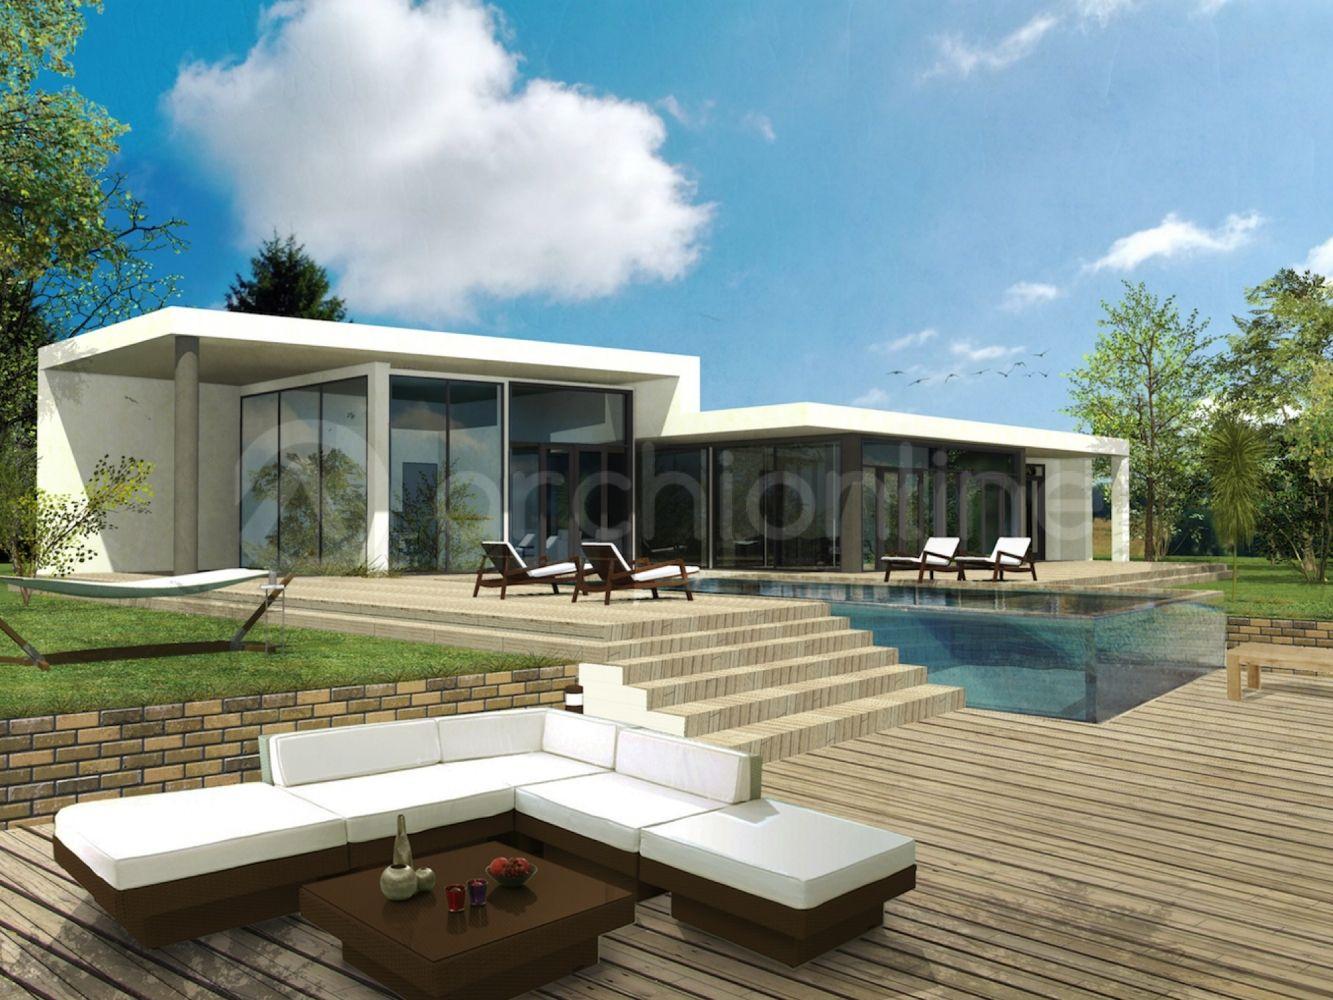 Plan Maison Moderne Maison Max Ce16789f5 Jpeg 1333 1000 Pinterest Projekte